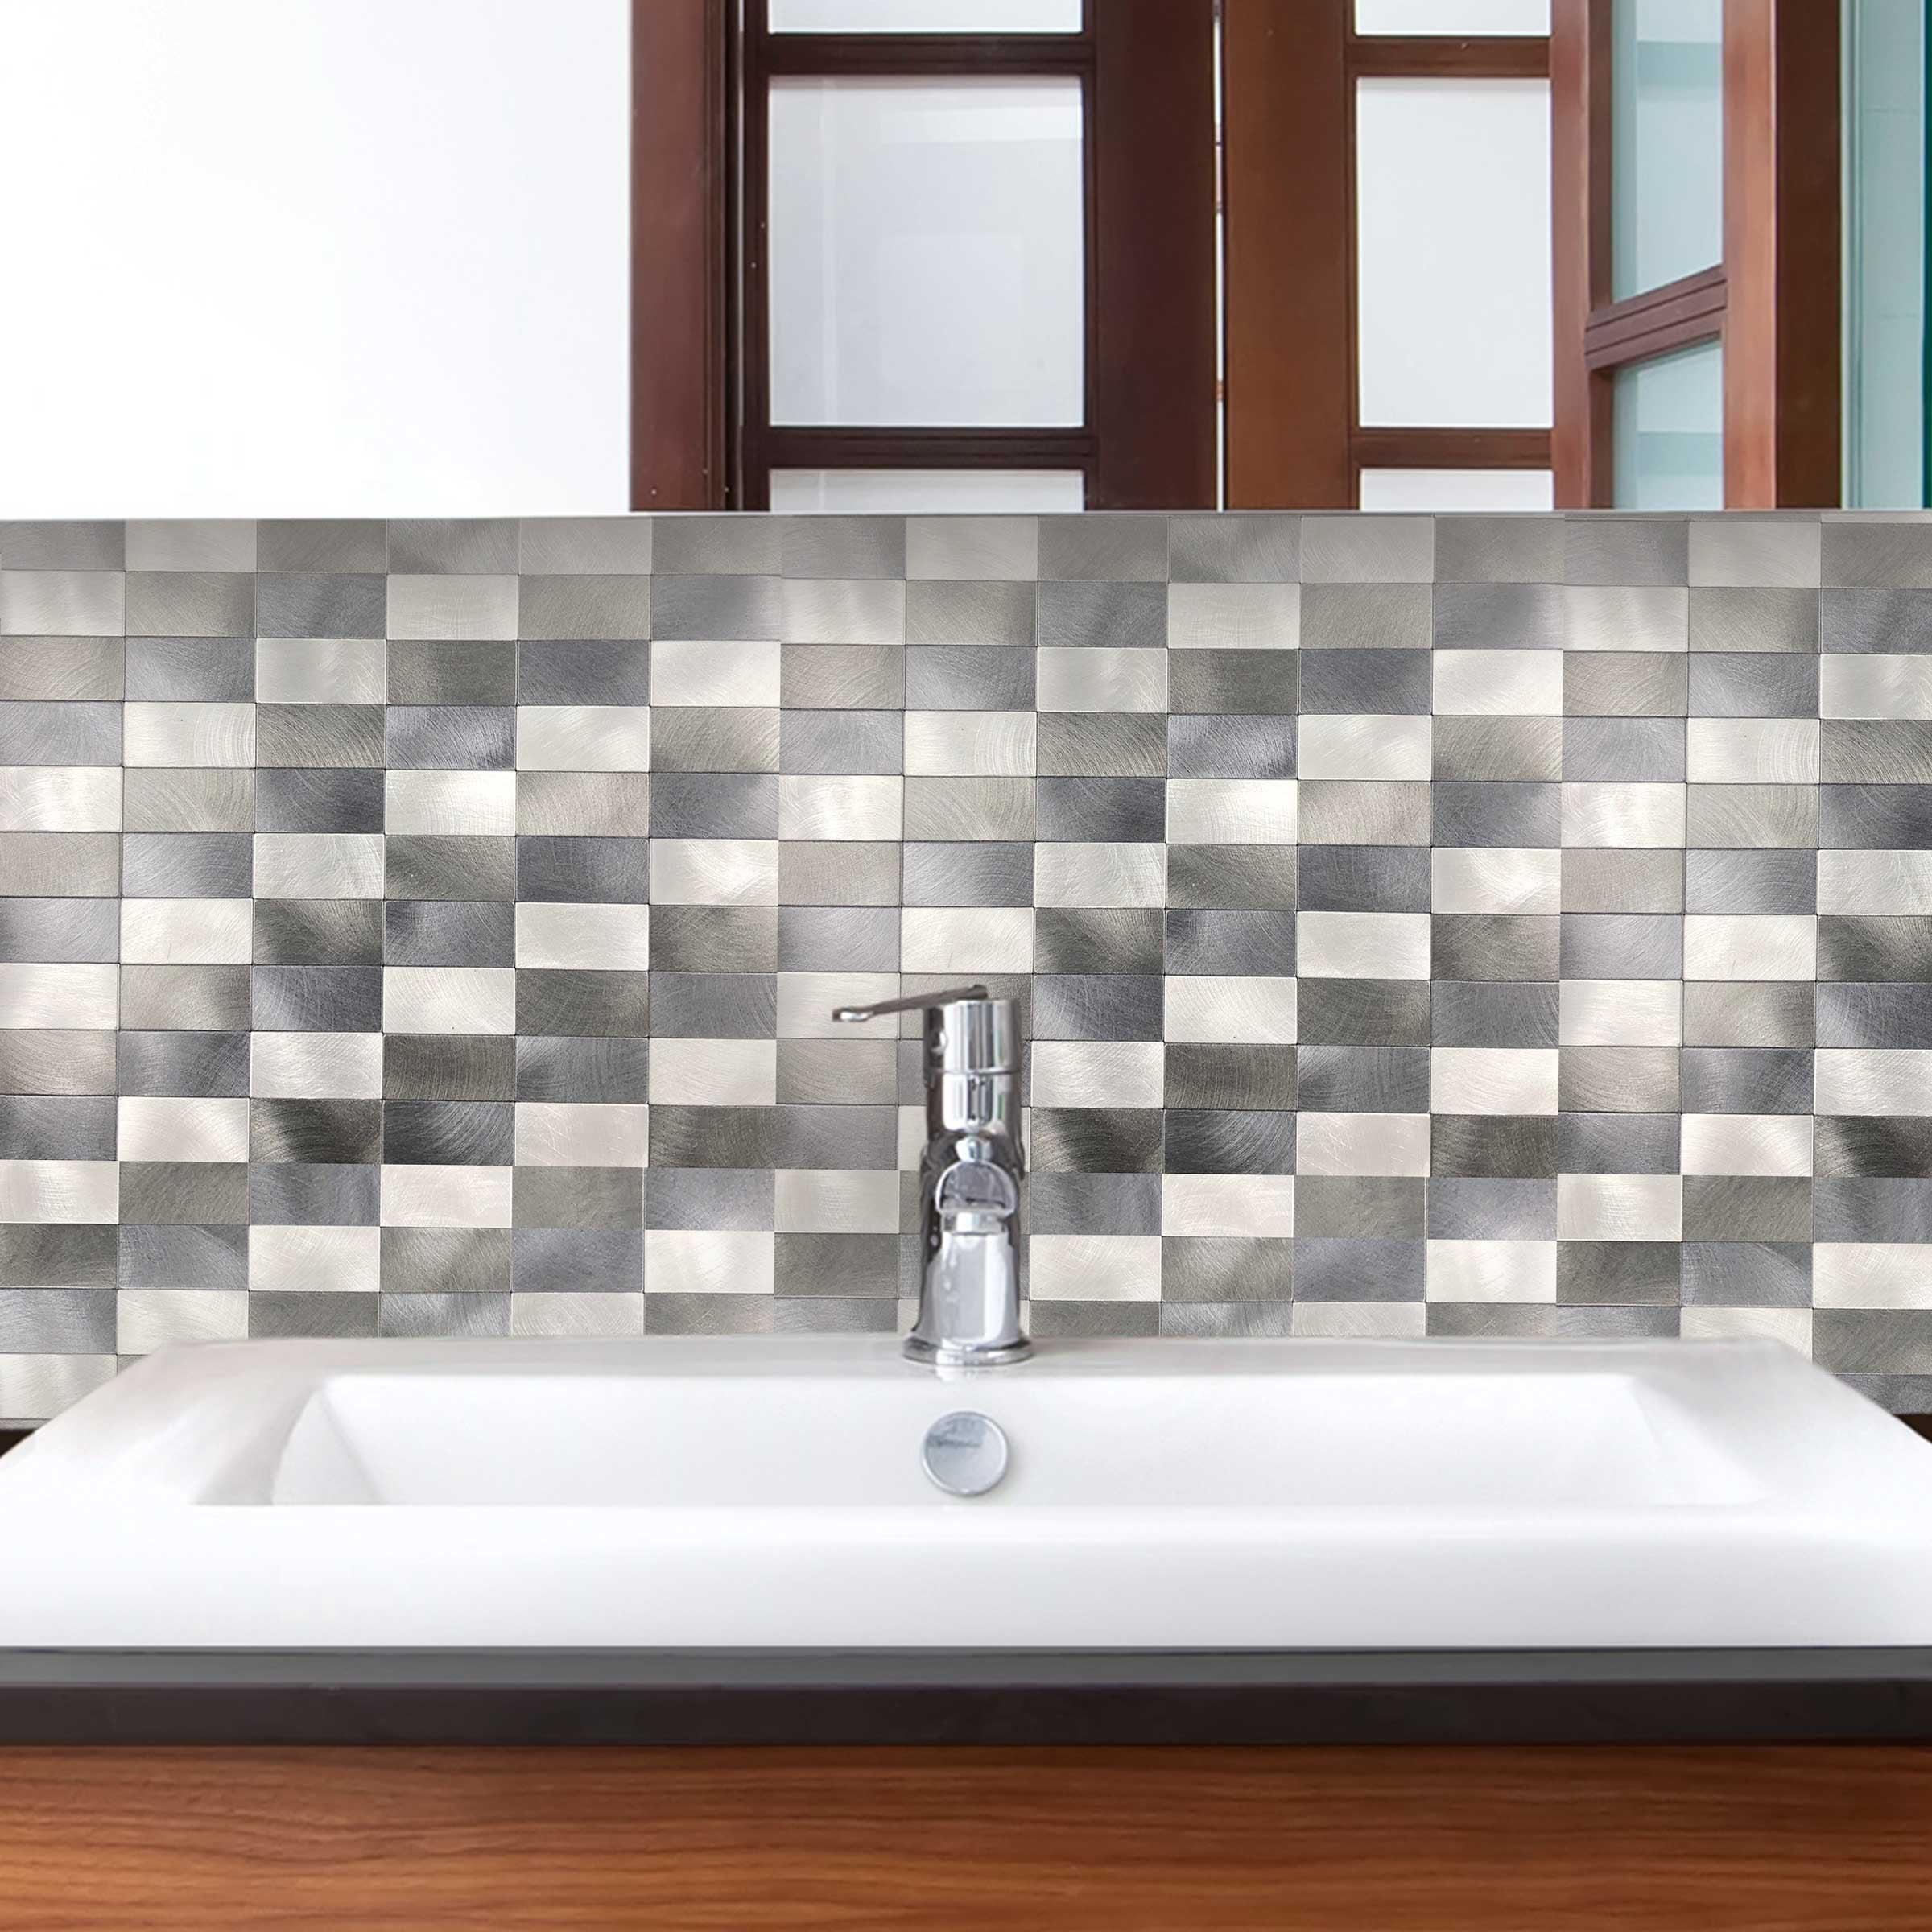 - DIP Copper Wire 12 X 12 Self-Adhesive PVC Aluminum Tile Backsplash